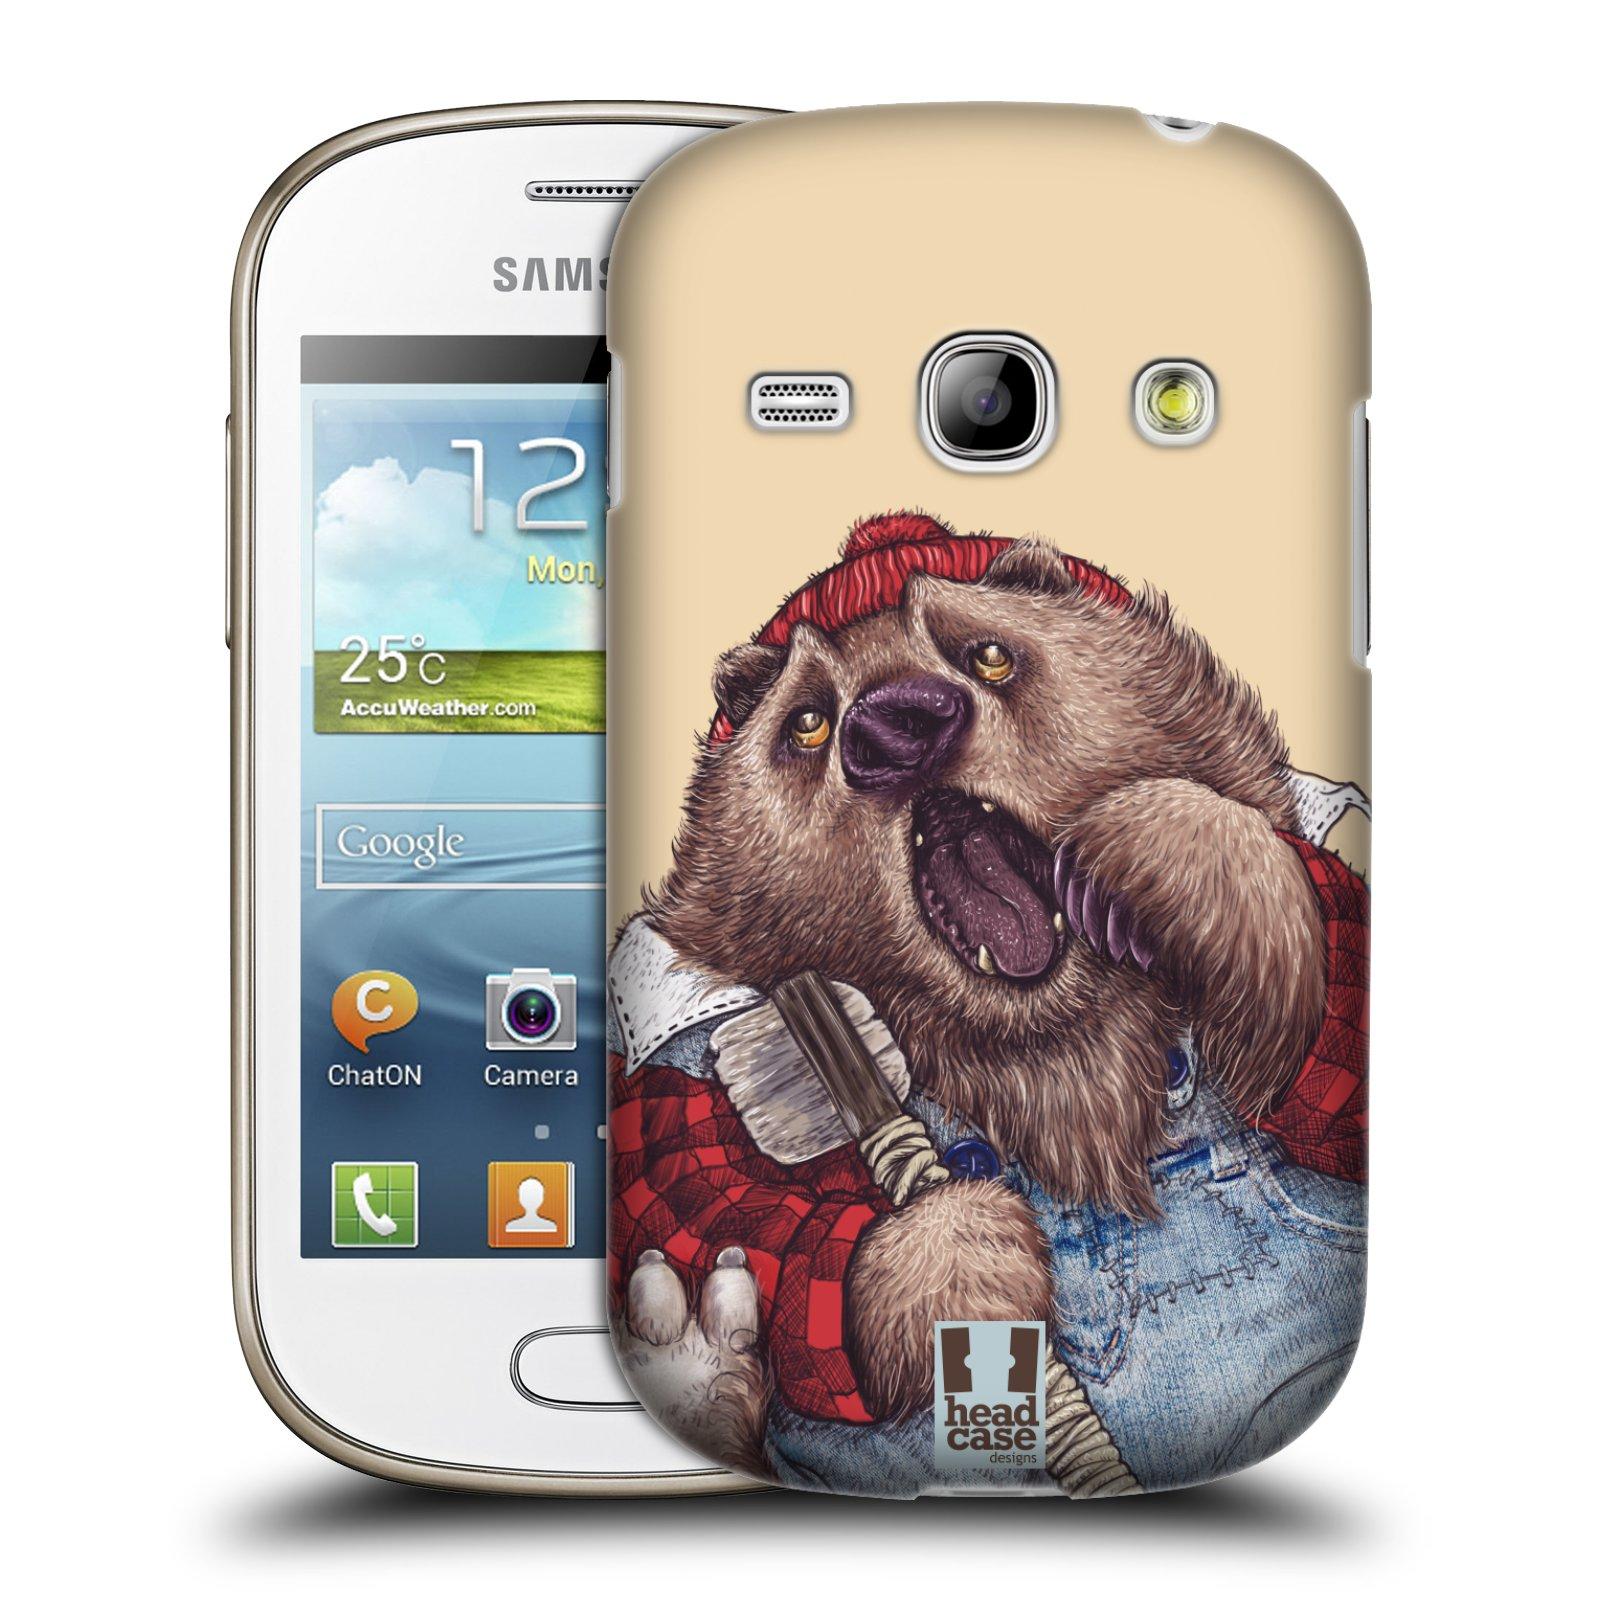 HEAD CASE plastový obal na mobil SAMSUNG GALAXY FAME (S6810) vzor Kreslená zvířátka medvěd